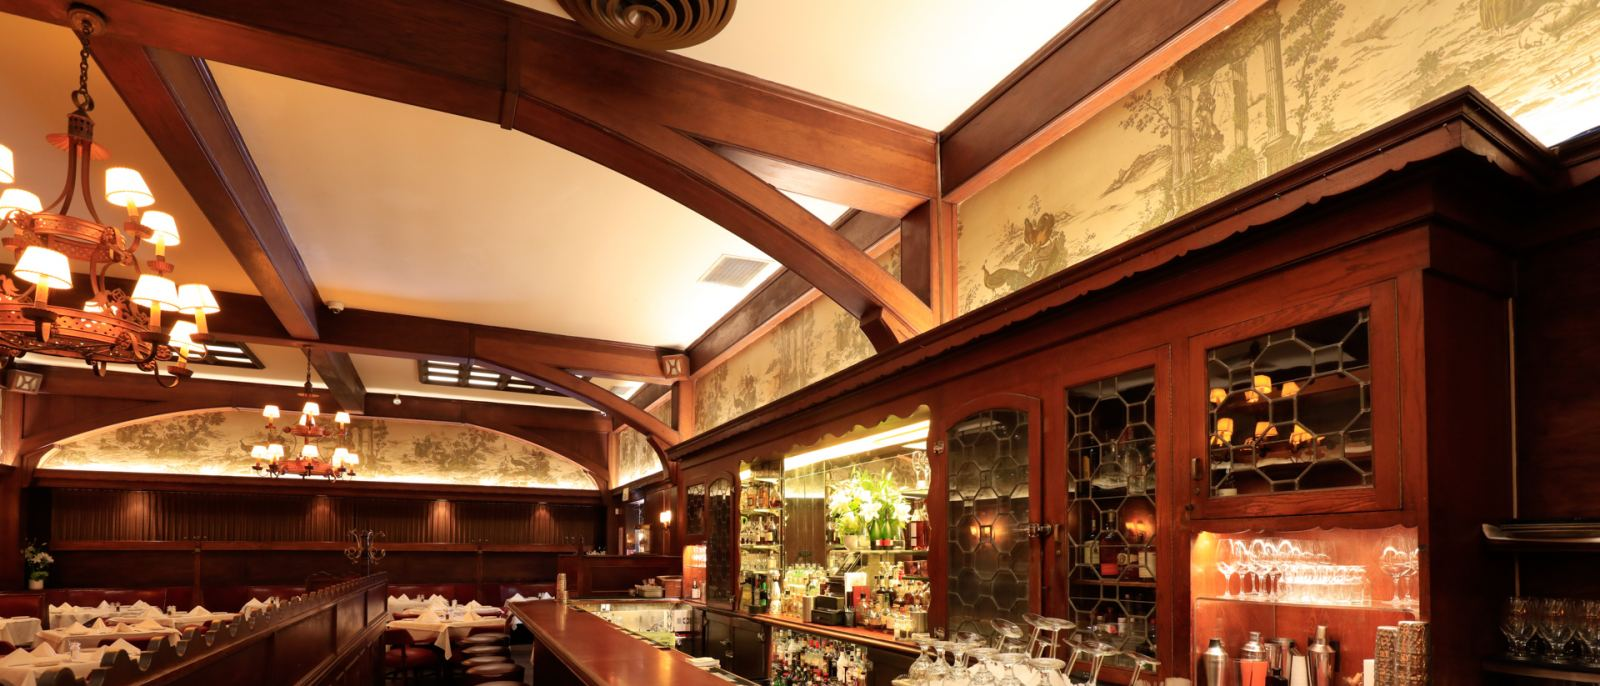 The bar at Musso & Frank Grill | Photo: Yuri Hasegawa